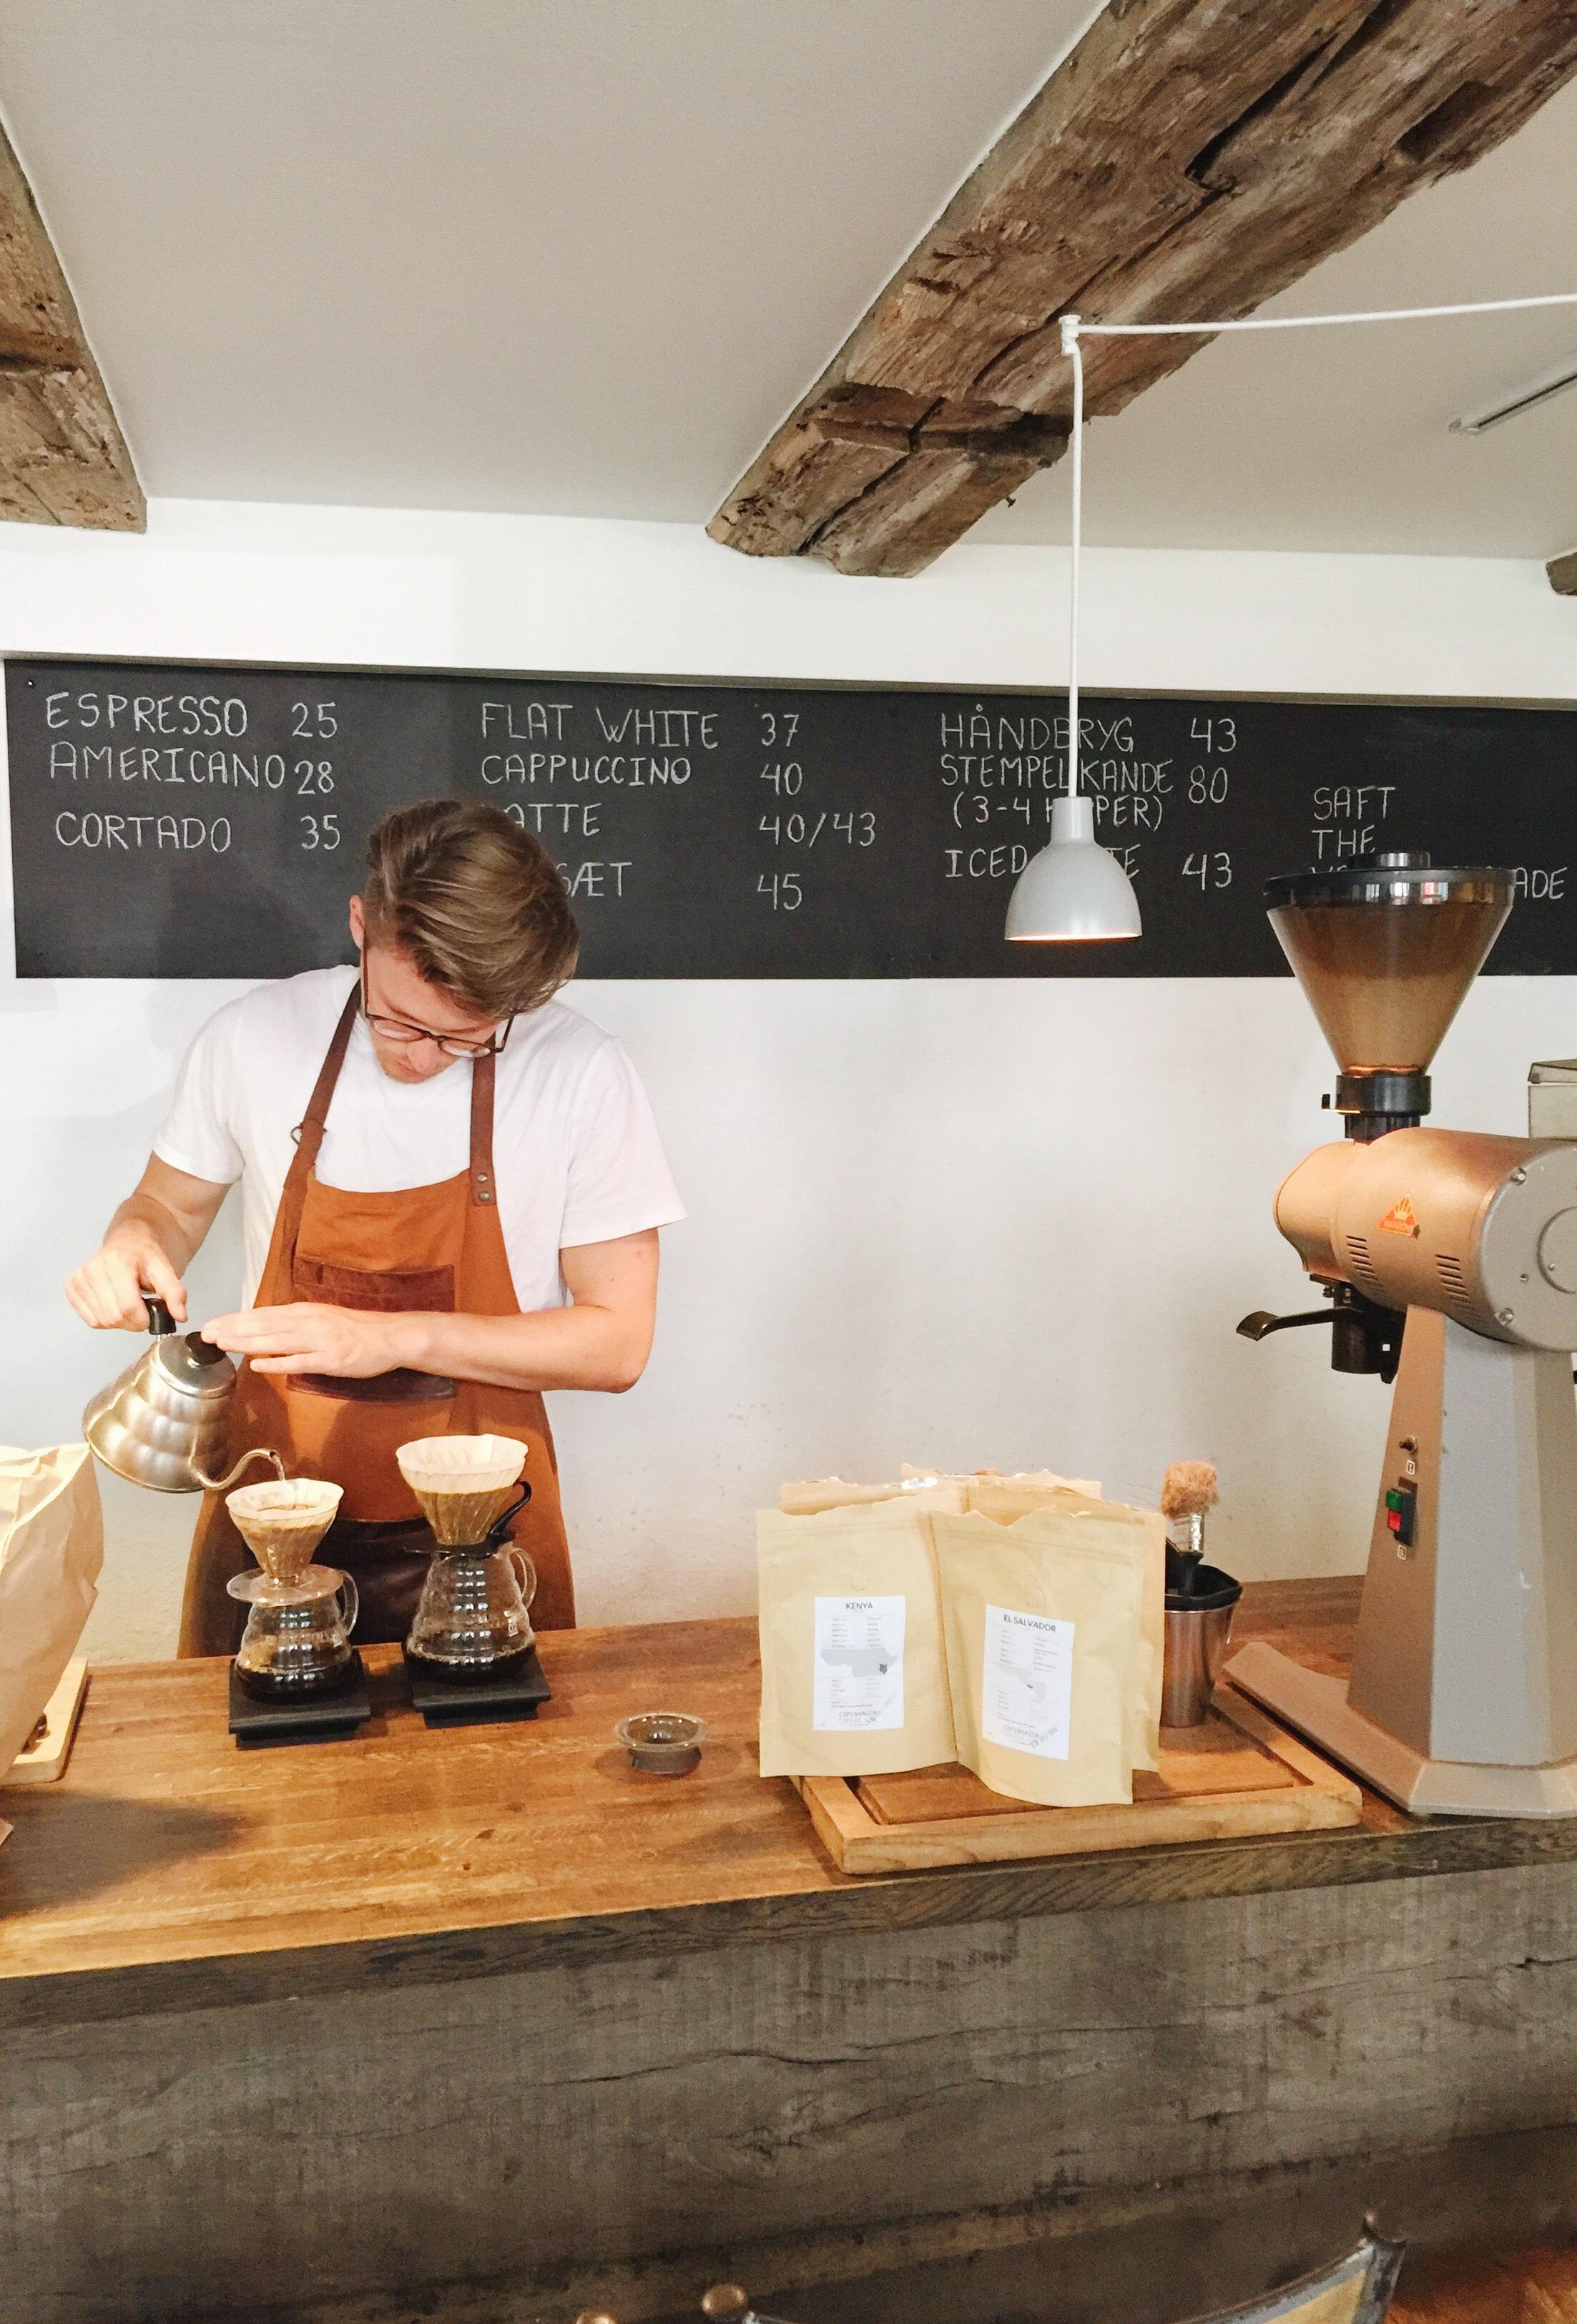 Copenhagen Coffee Lab's café in central Copenhagen